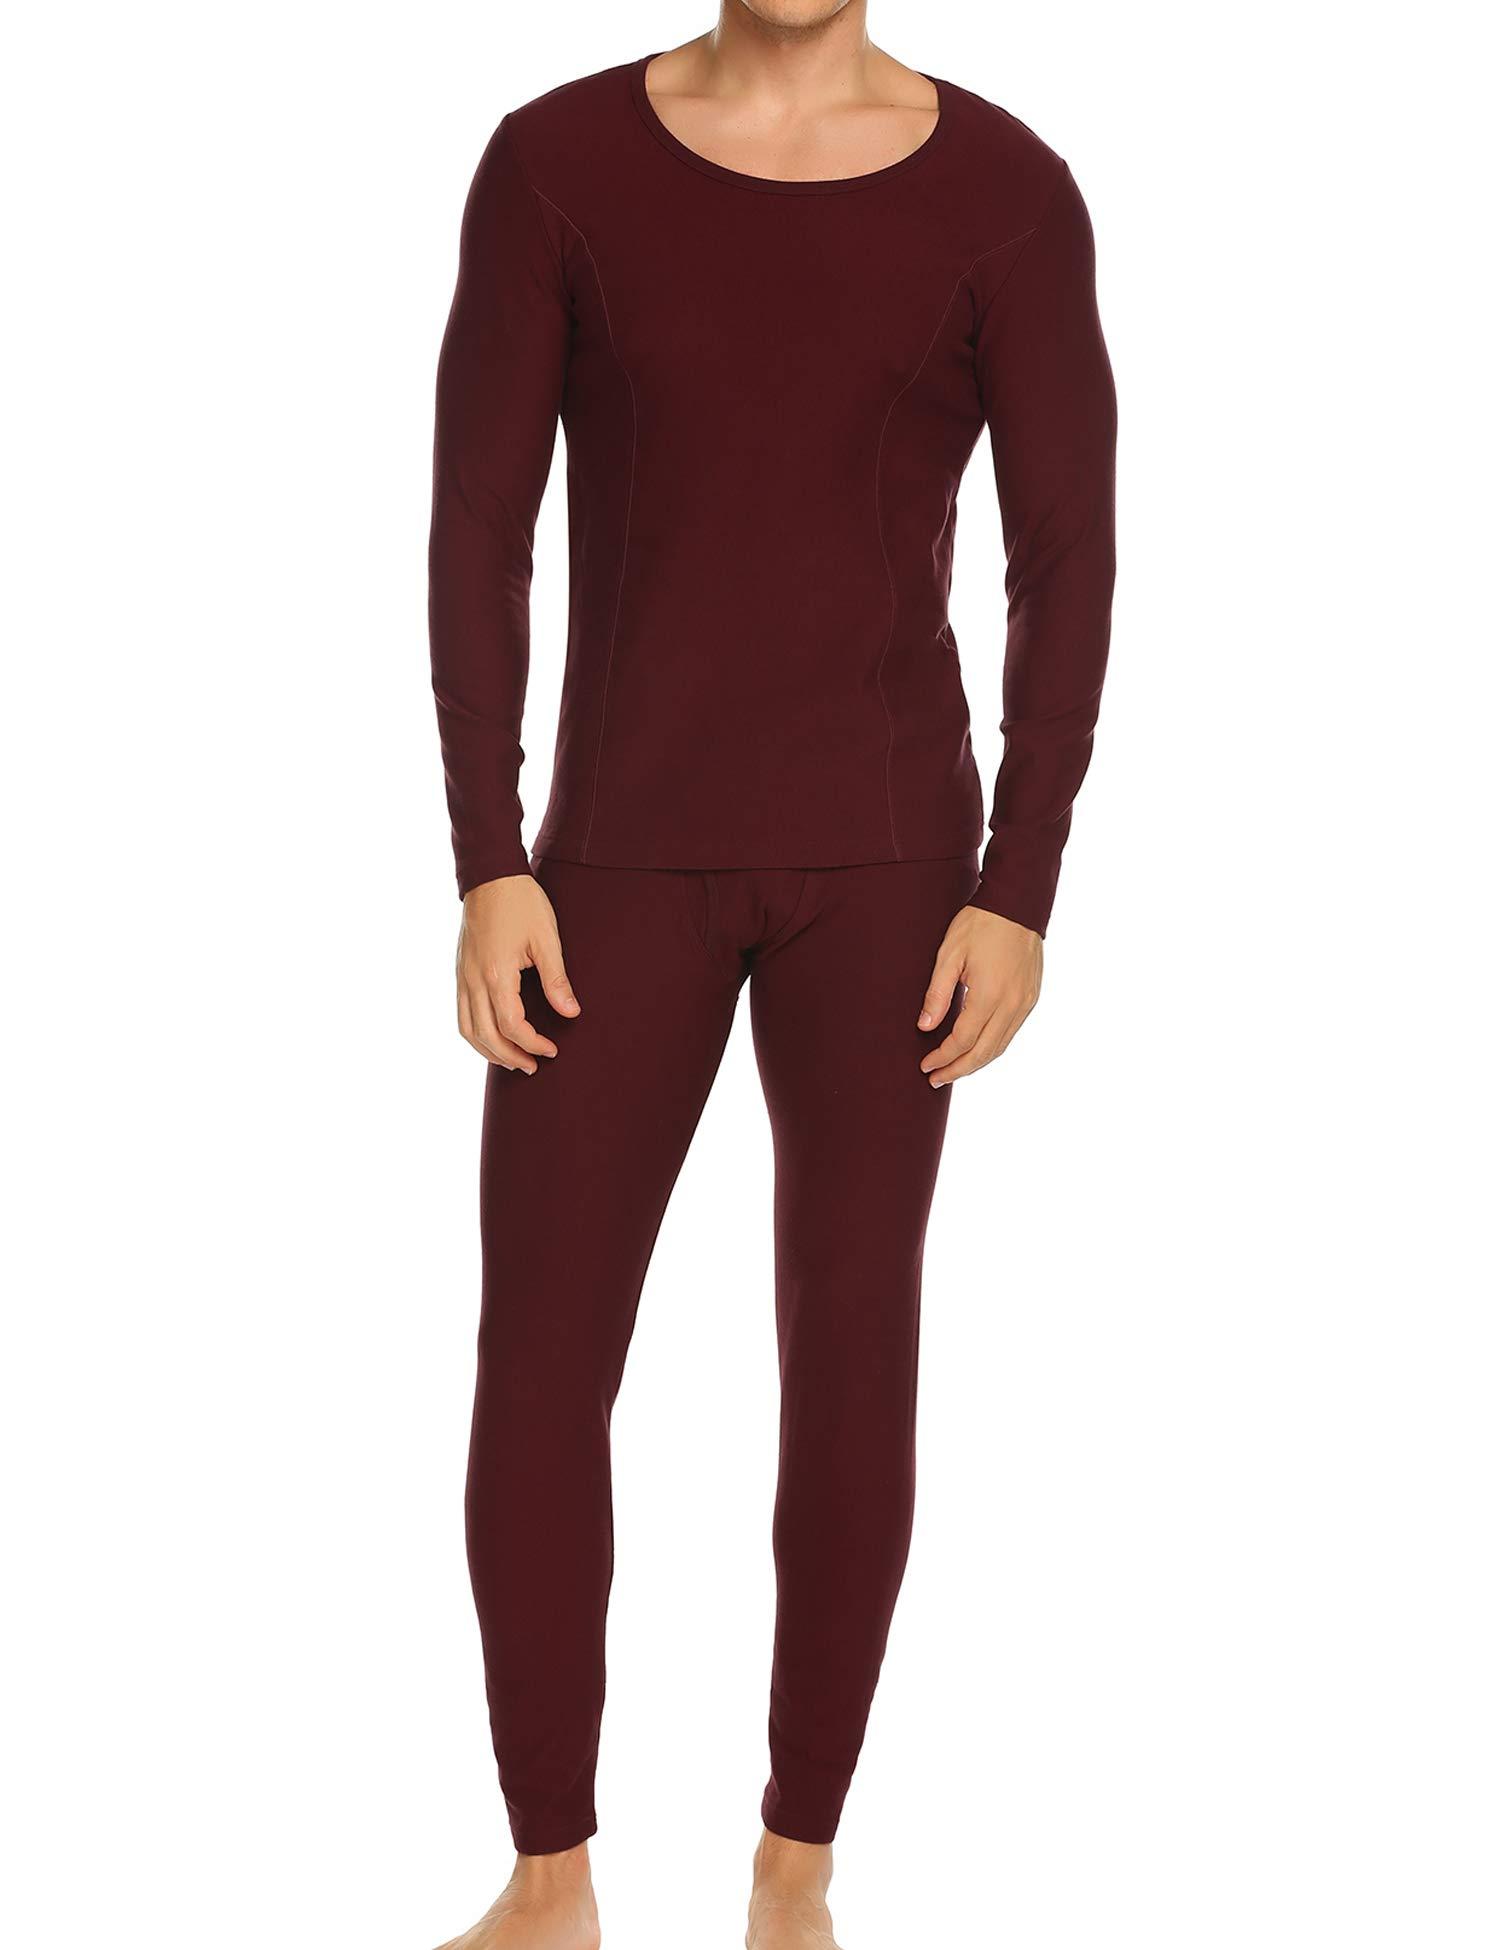 Ekouaer Warm Pajama Set Plus Size Men's Thermal